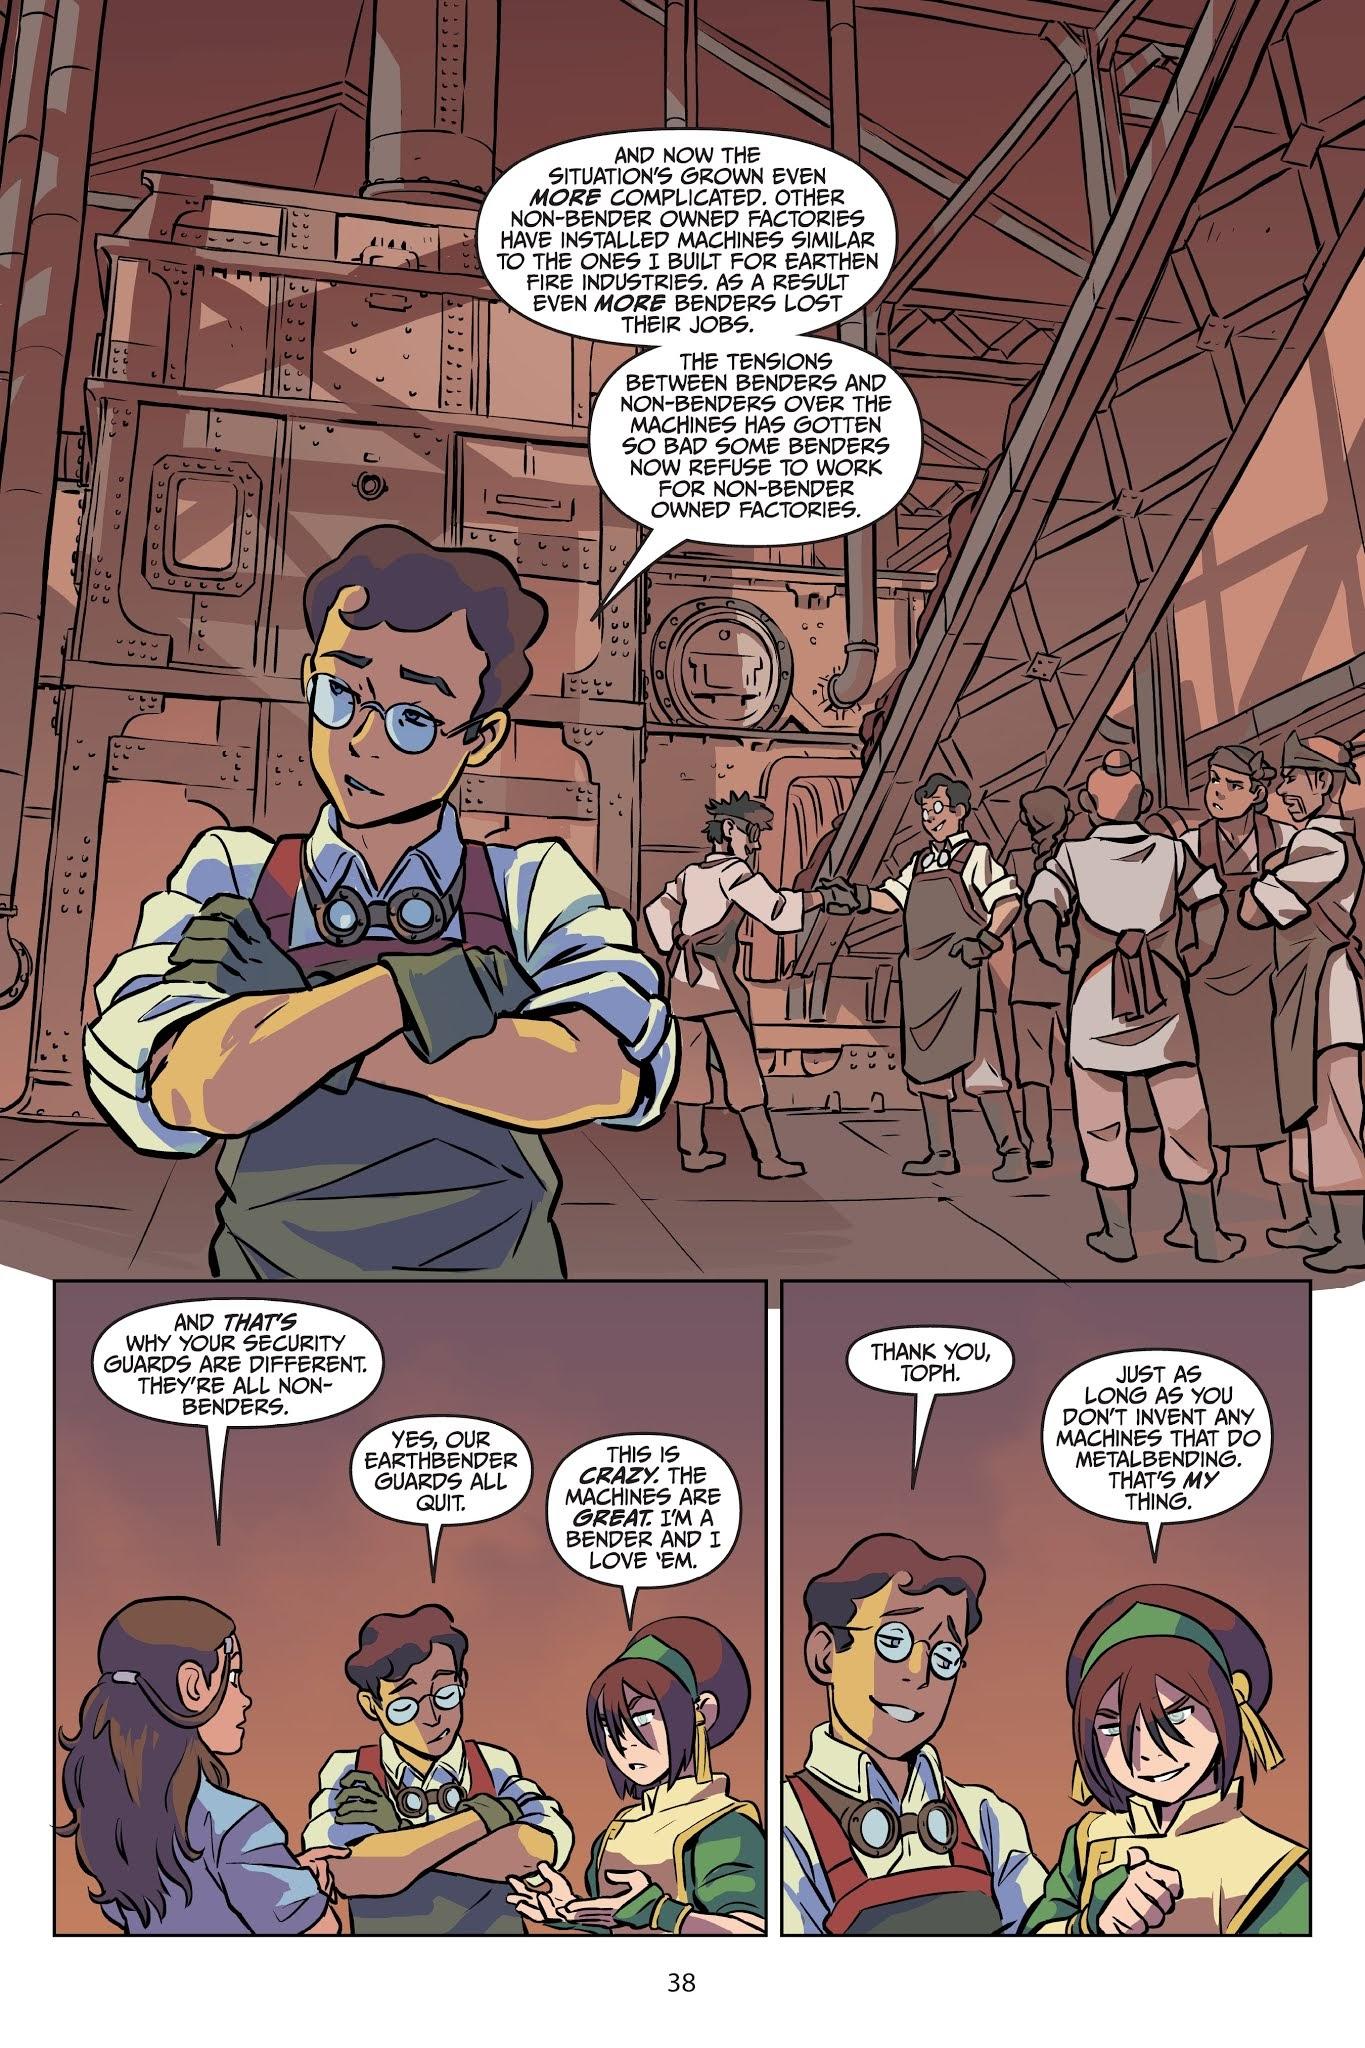 Issue # TPB 1 - Nickelodeon Avatar: The Last Airbender